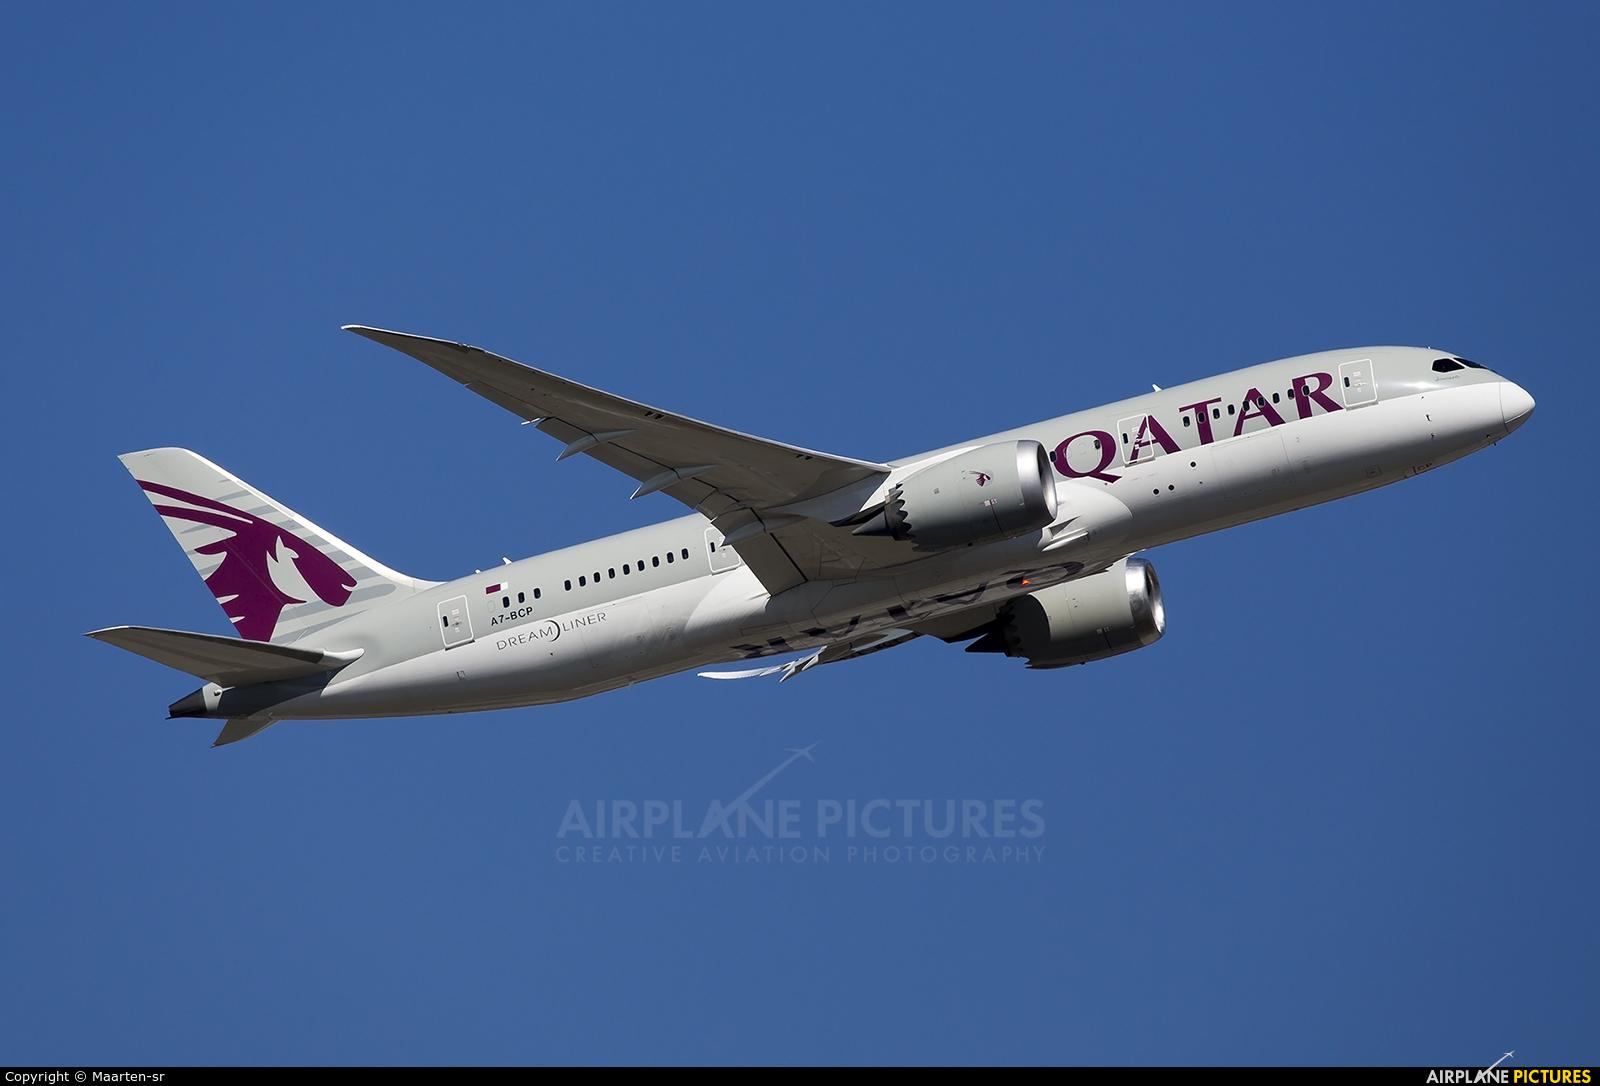 Qatar Airways A7-BCP aircraft at Frankfurt